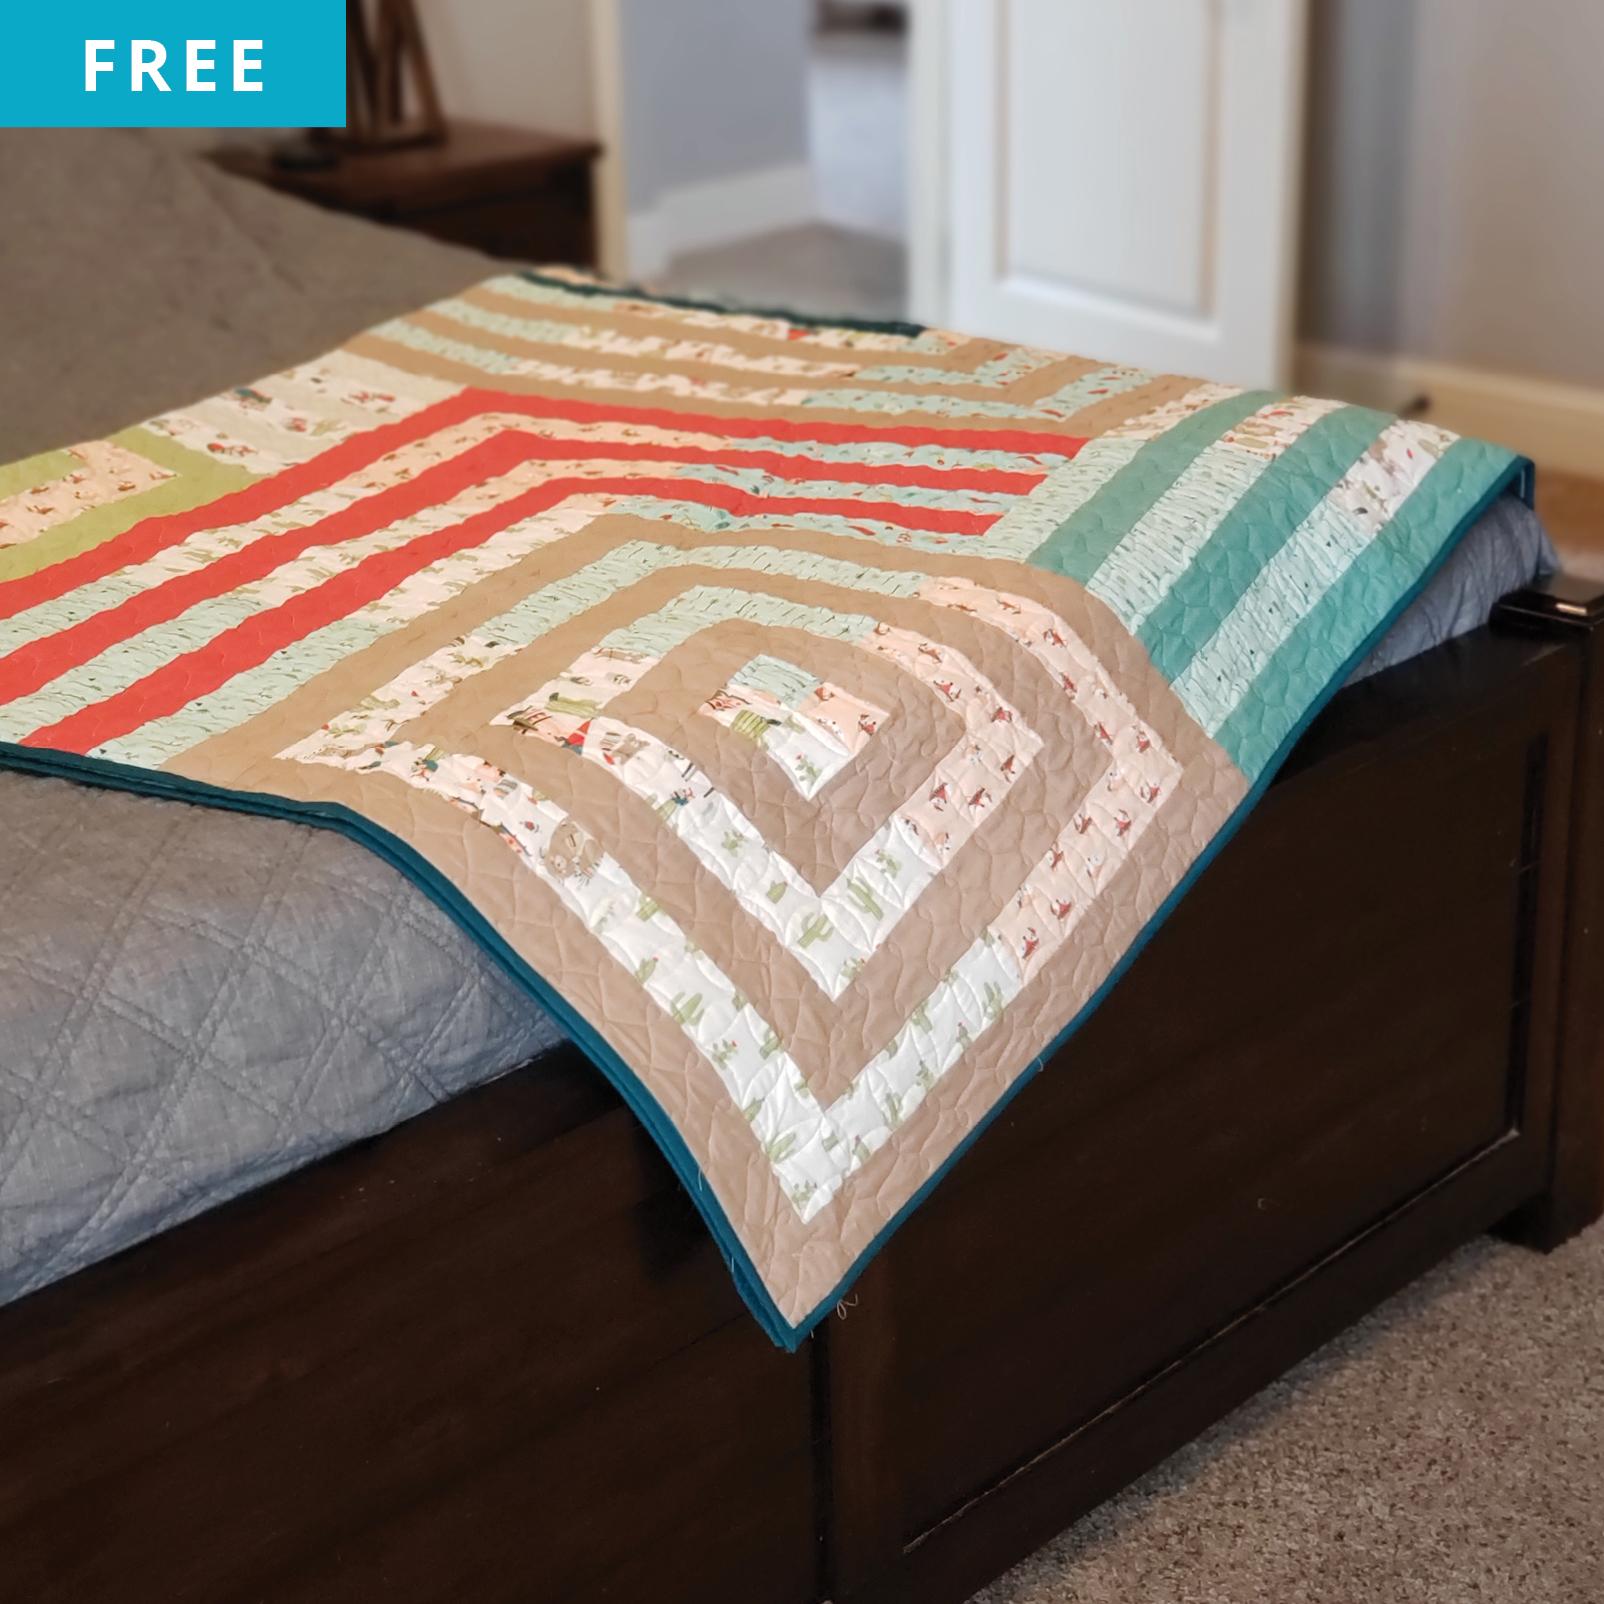 Free Quilt Pattern - Tetris Tumble Quilt